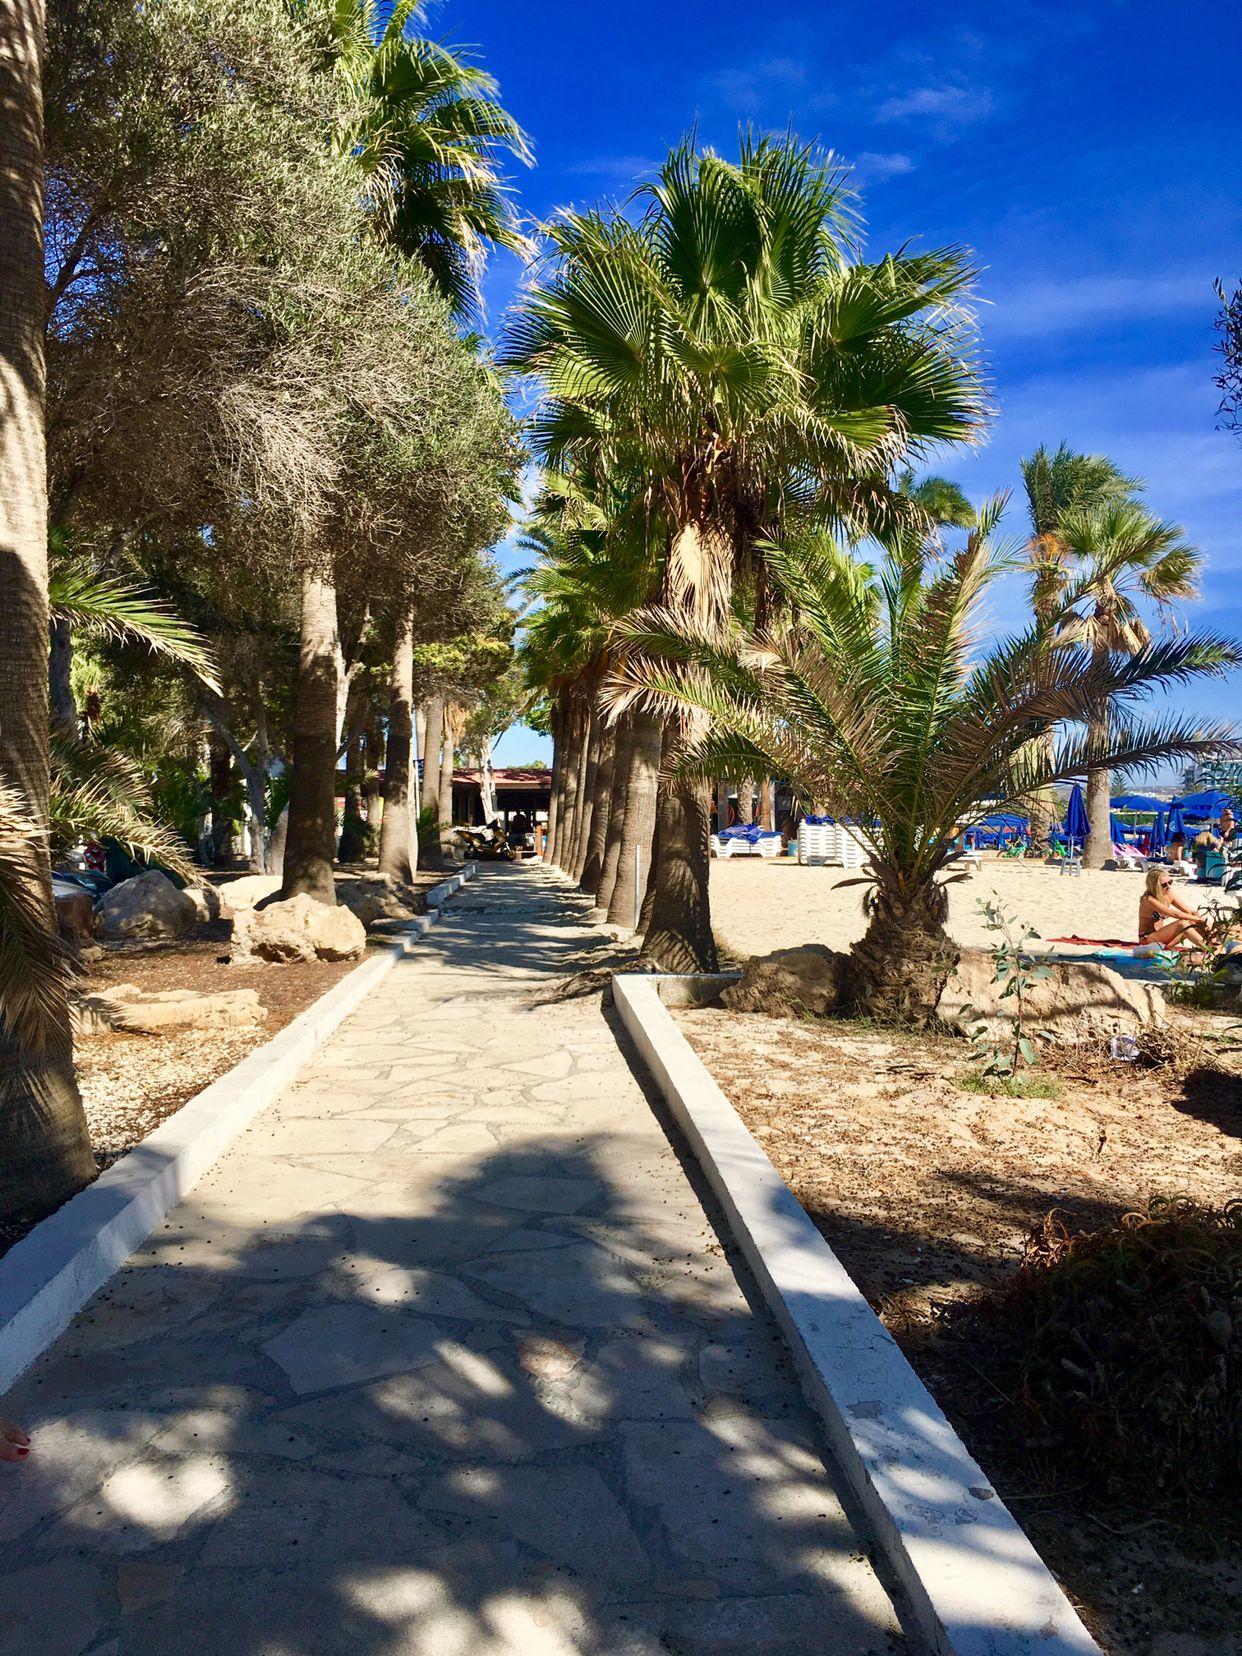 Beach wedding spots  Pin by Ellaaa Kit on The beach  Pinterest  Beach Nissi beach and